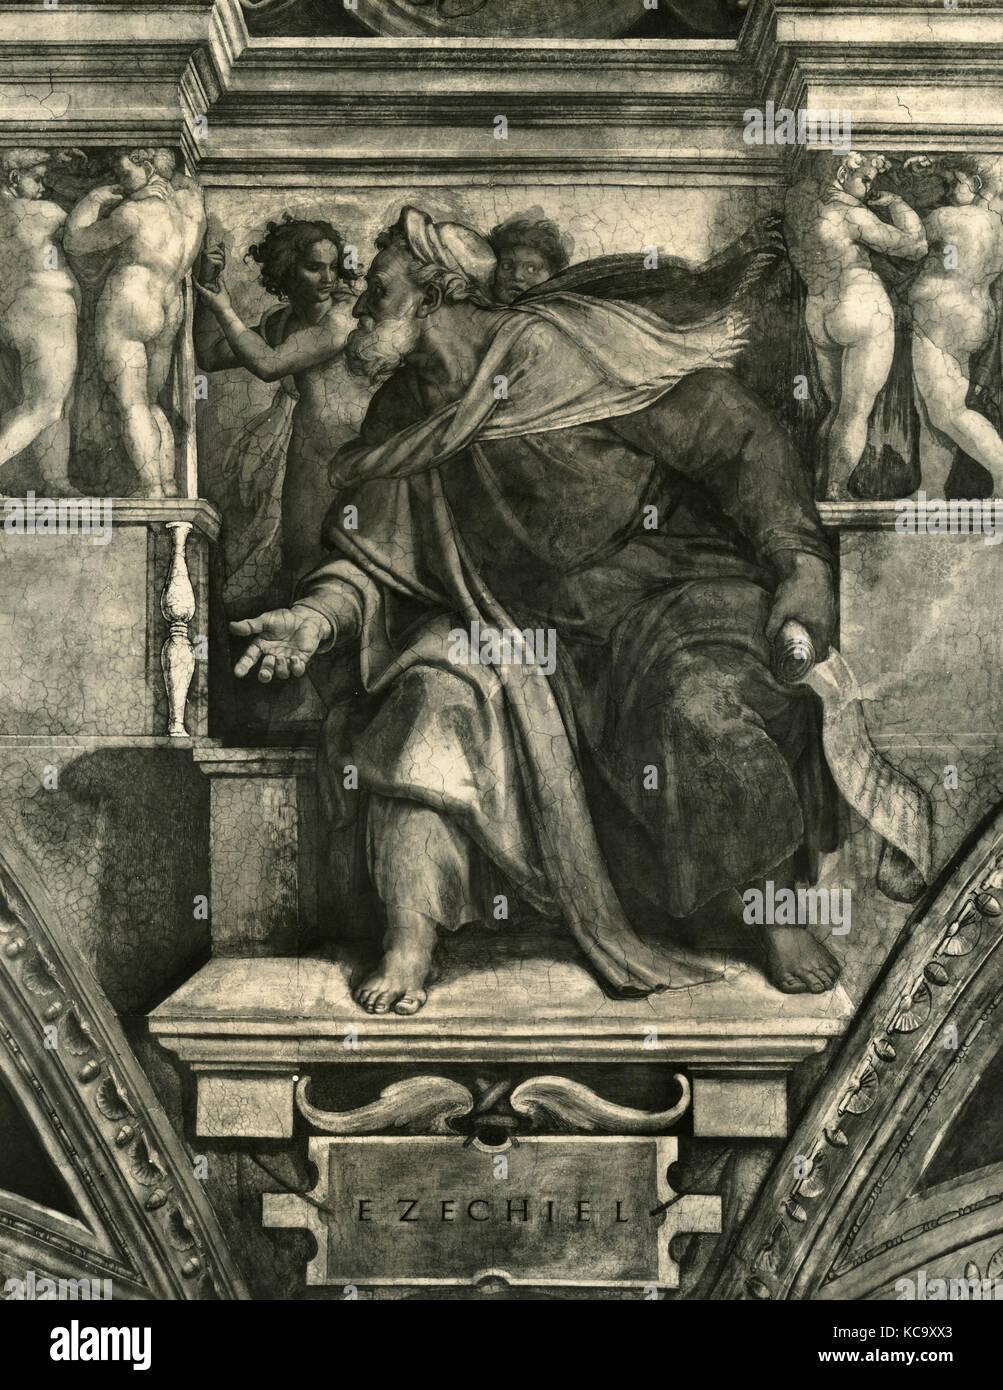 Prophet Ezekiel fresco by Michelangelo, Sistine Chapel - Stock Image